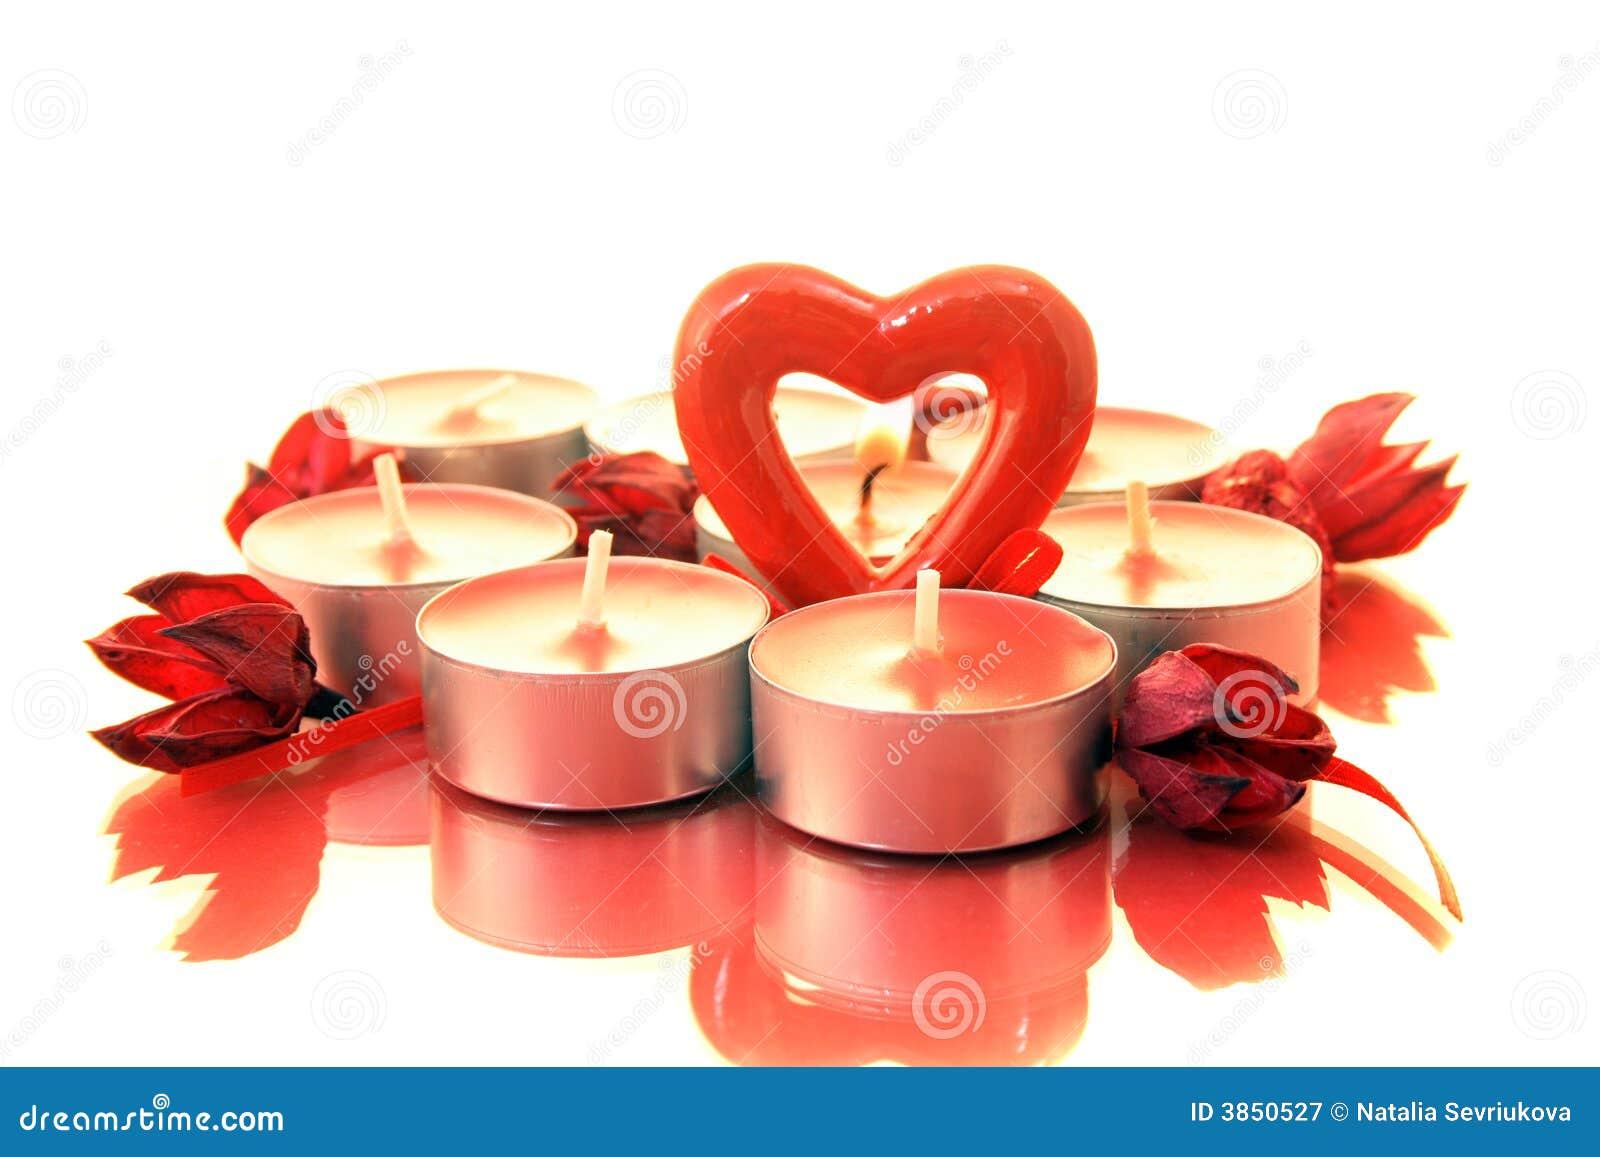 #C26309 Decoration; Christmas; Candle; Celebration Royalty Free  6361 décoration noel commerce 1300x957 px @ aertt.com